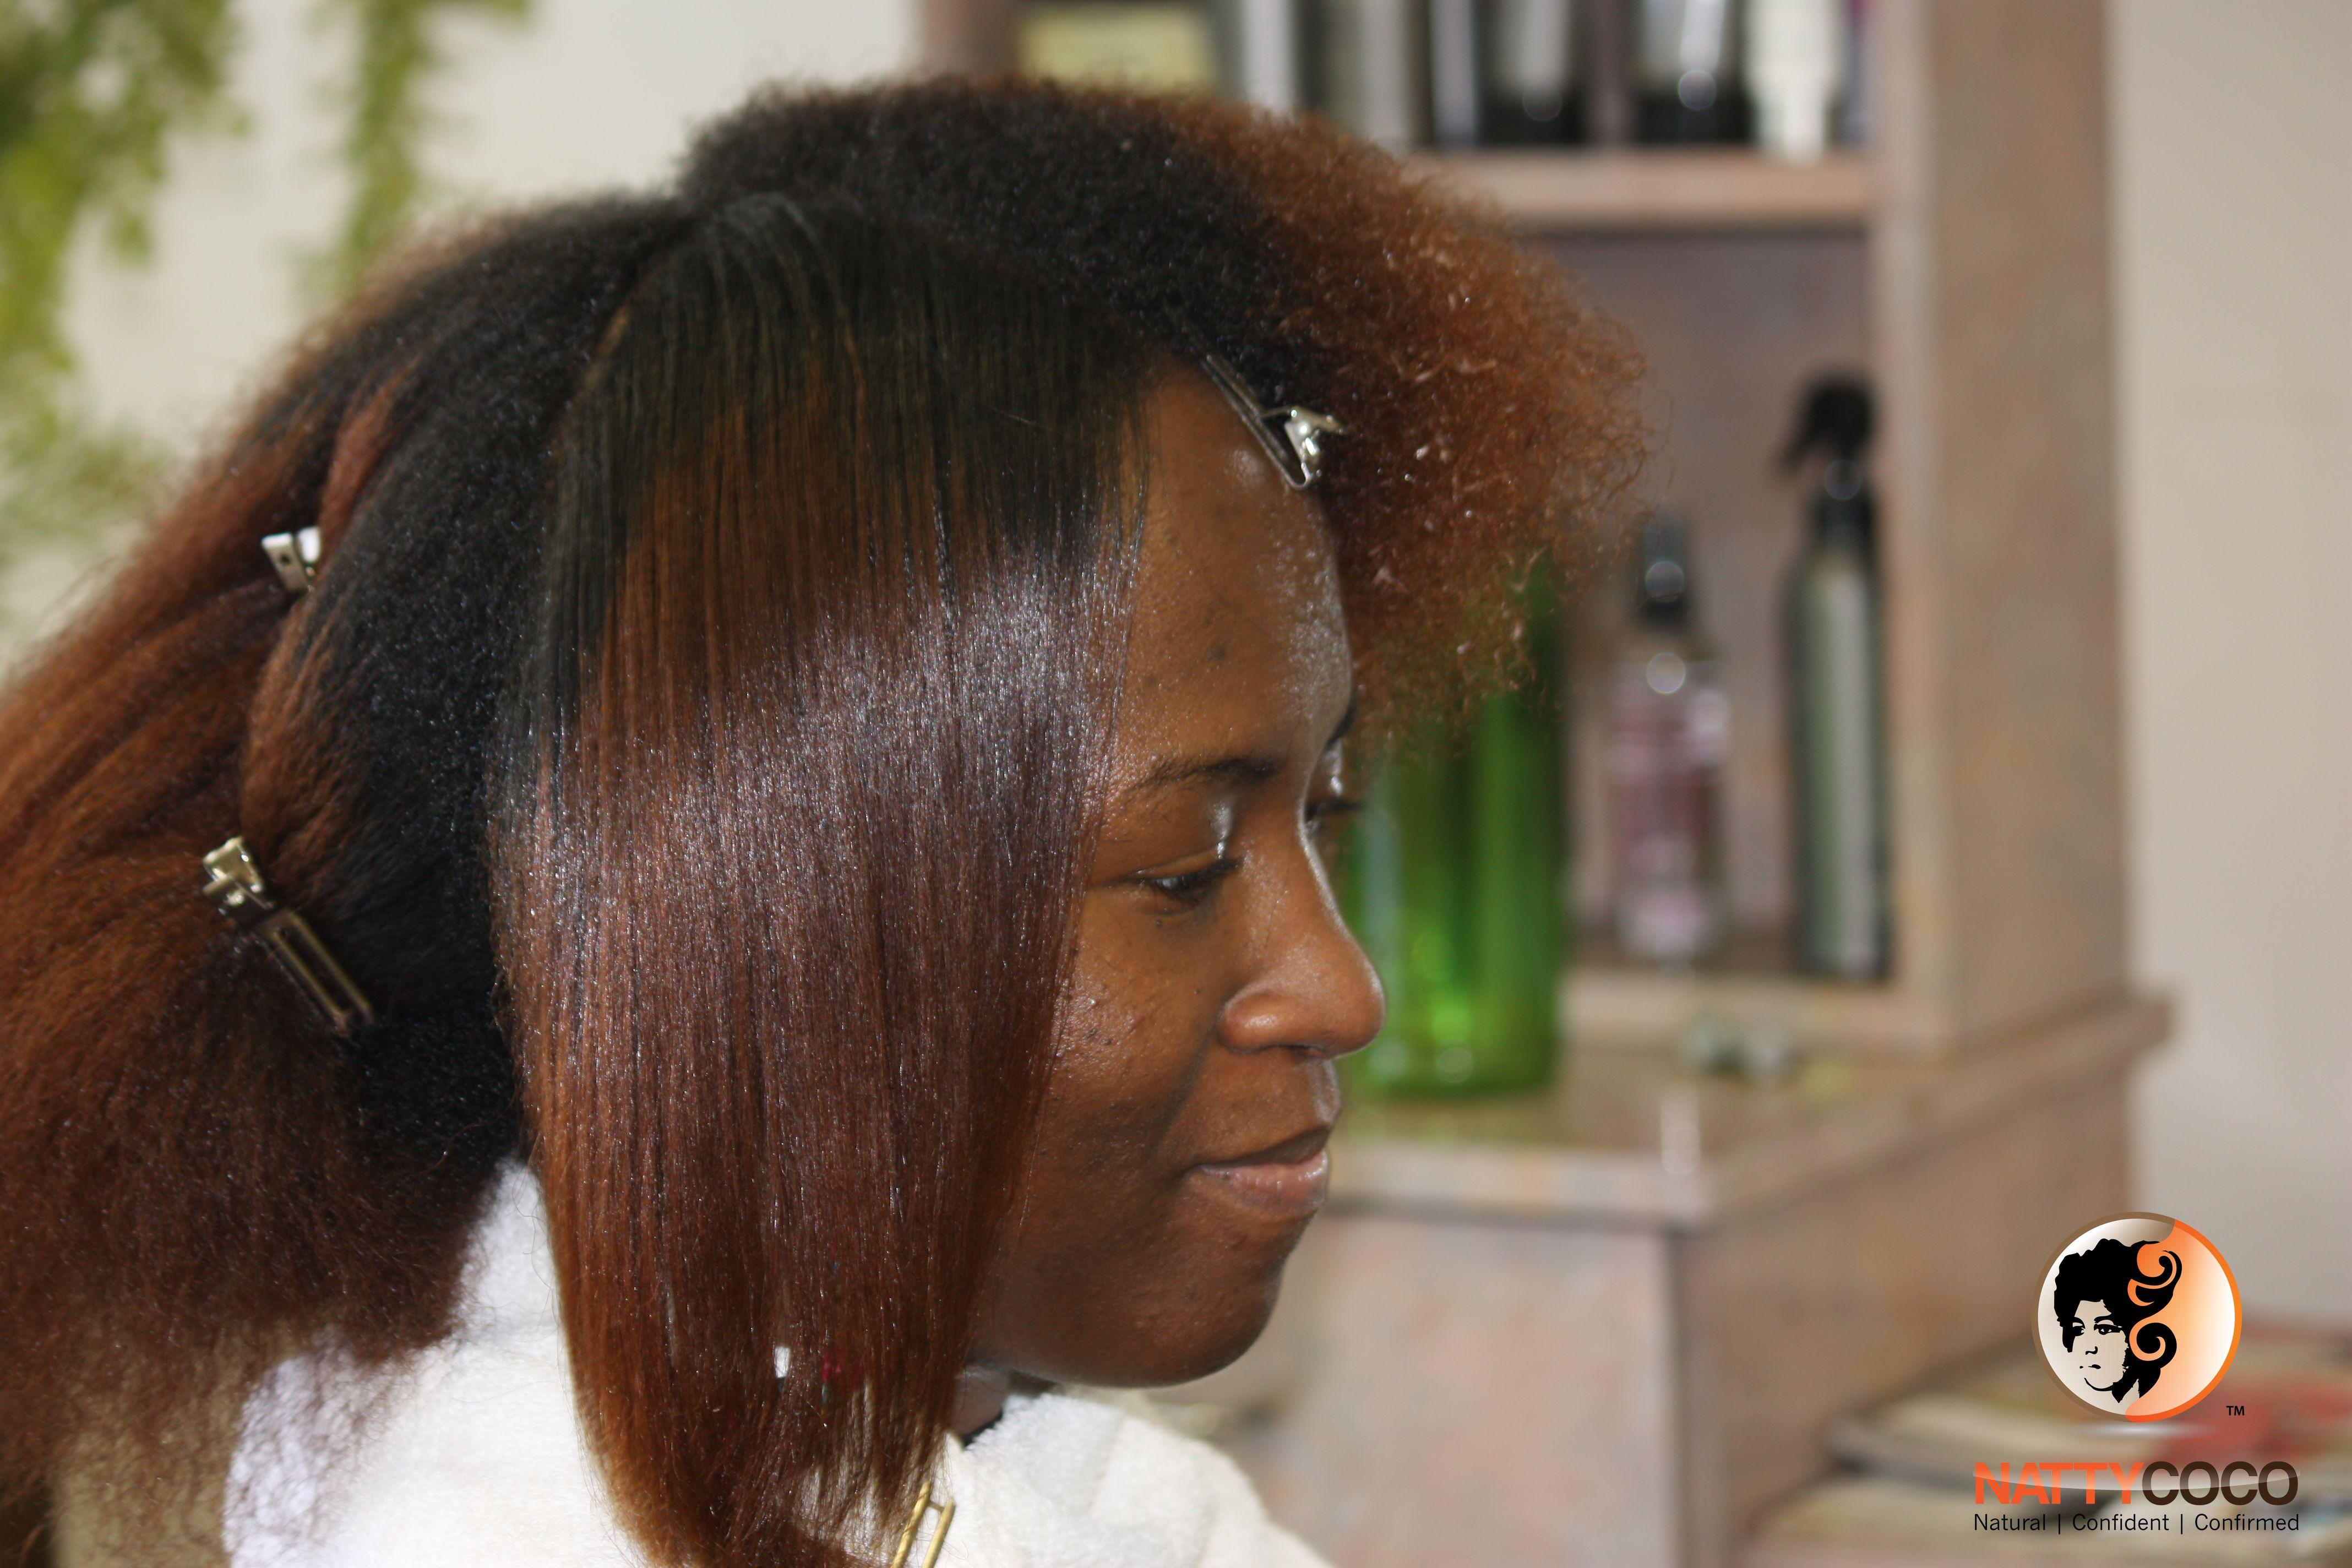 Flat iron afro textured hair straightening natural hair